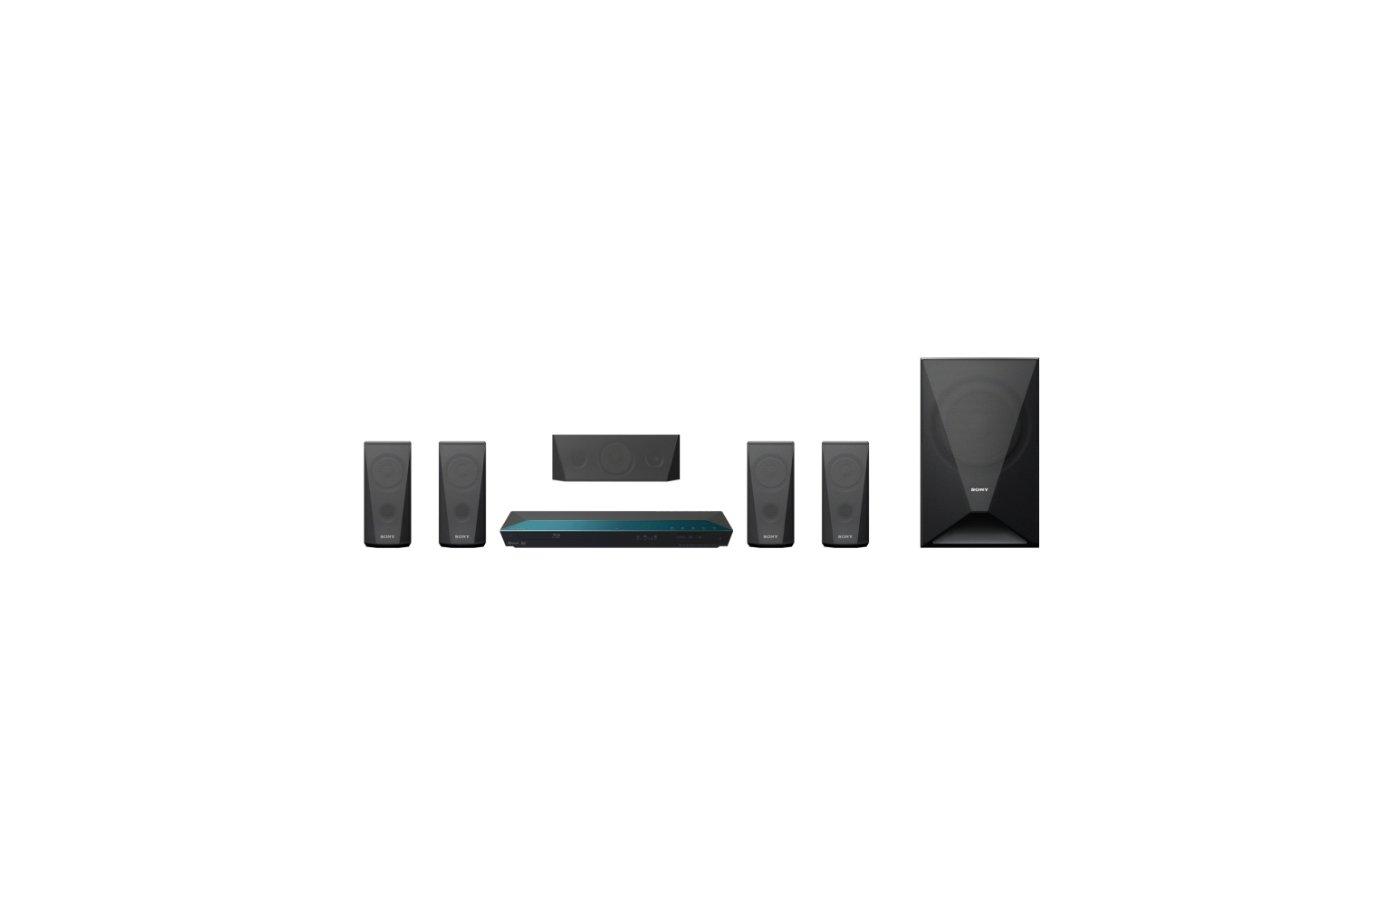 Домашний кинотеатр Blu-Ray SONY BDV-E3100